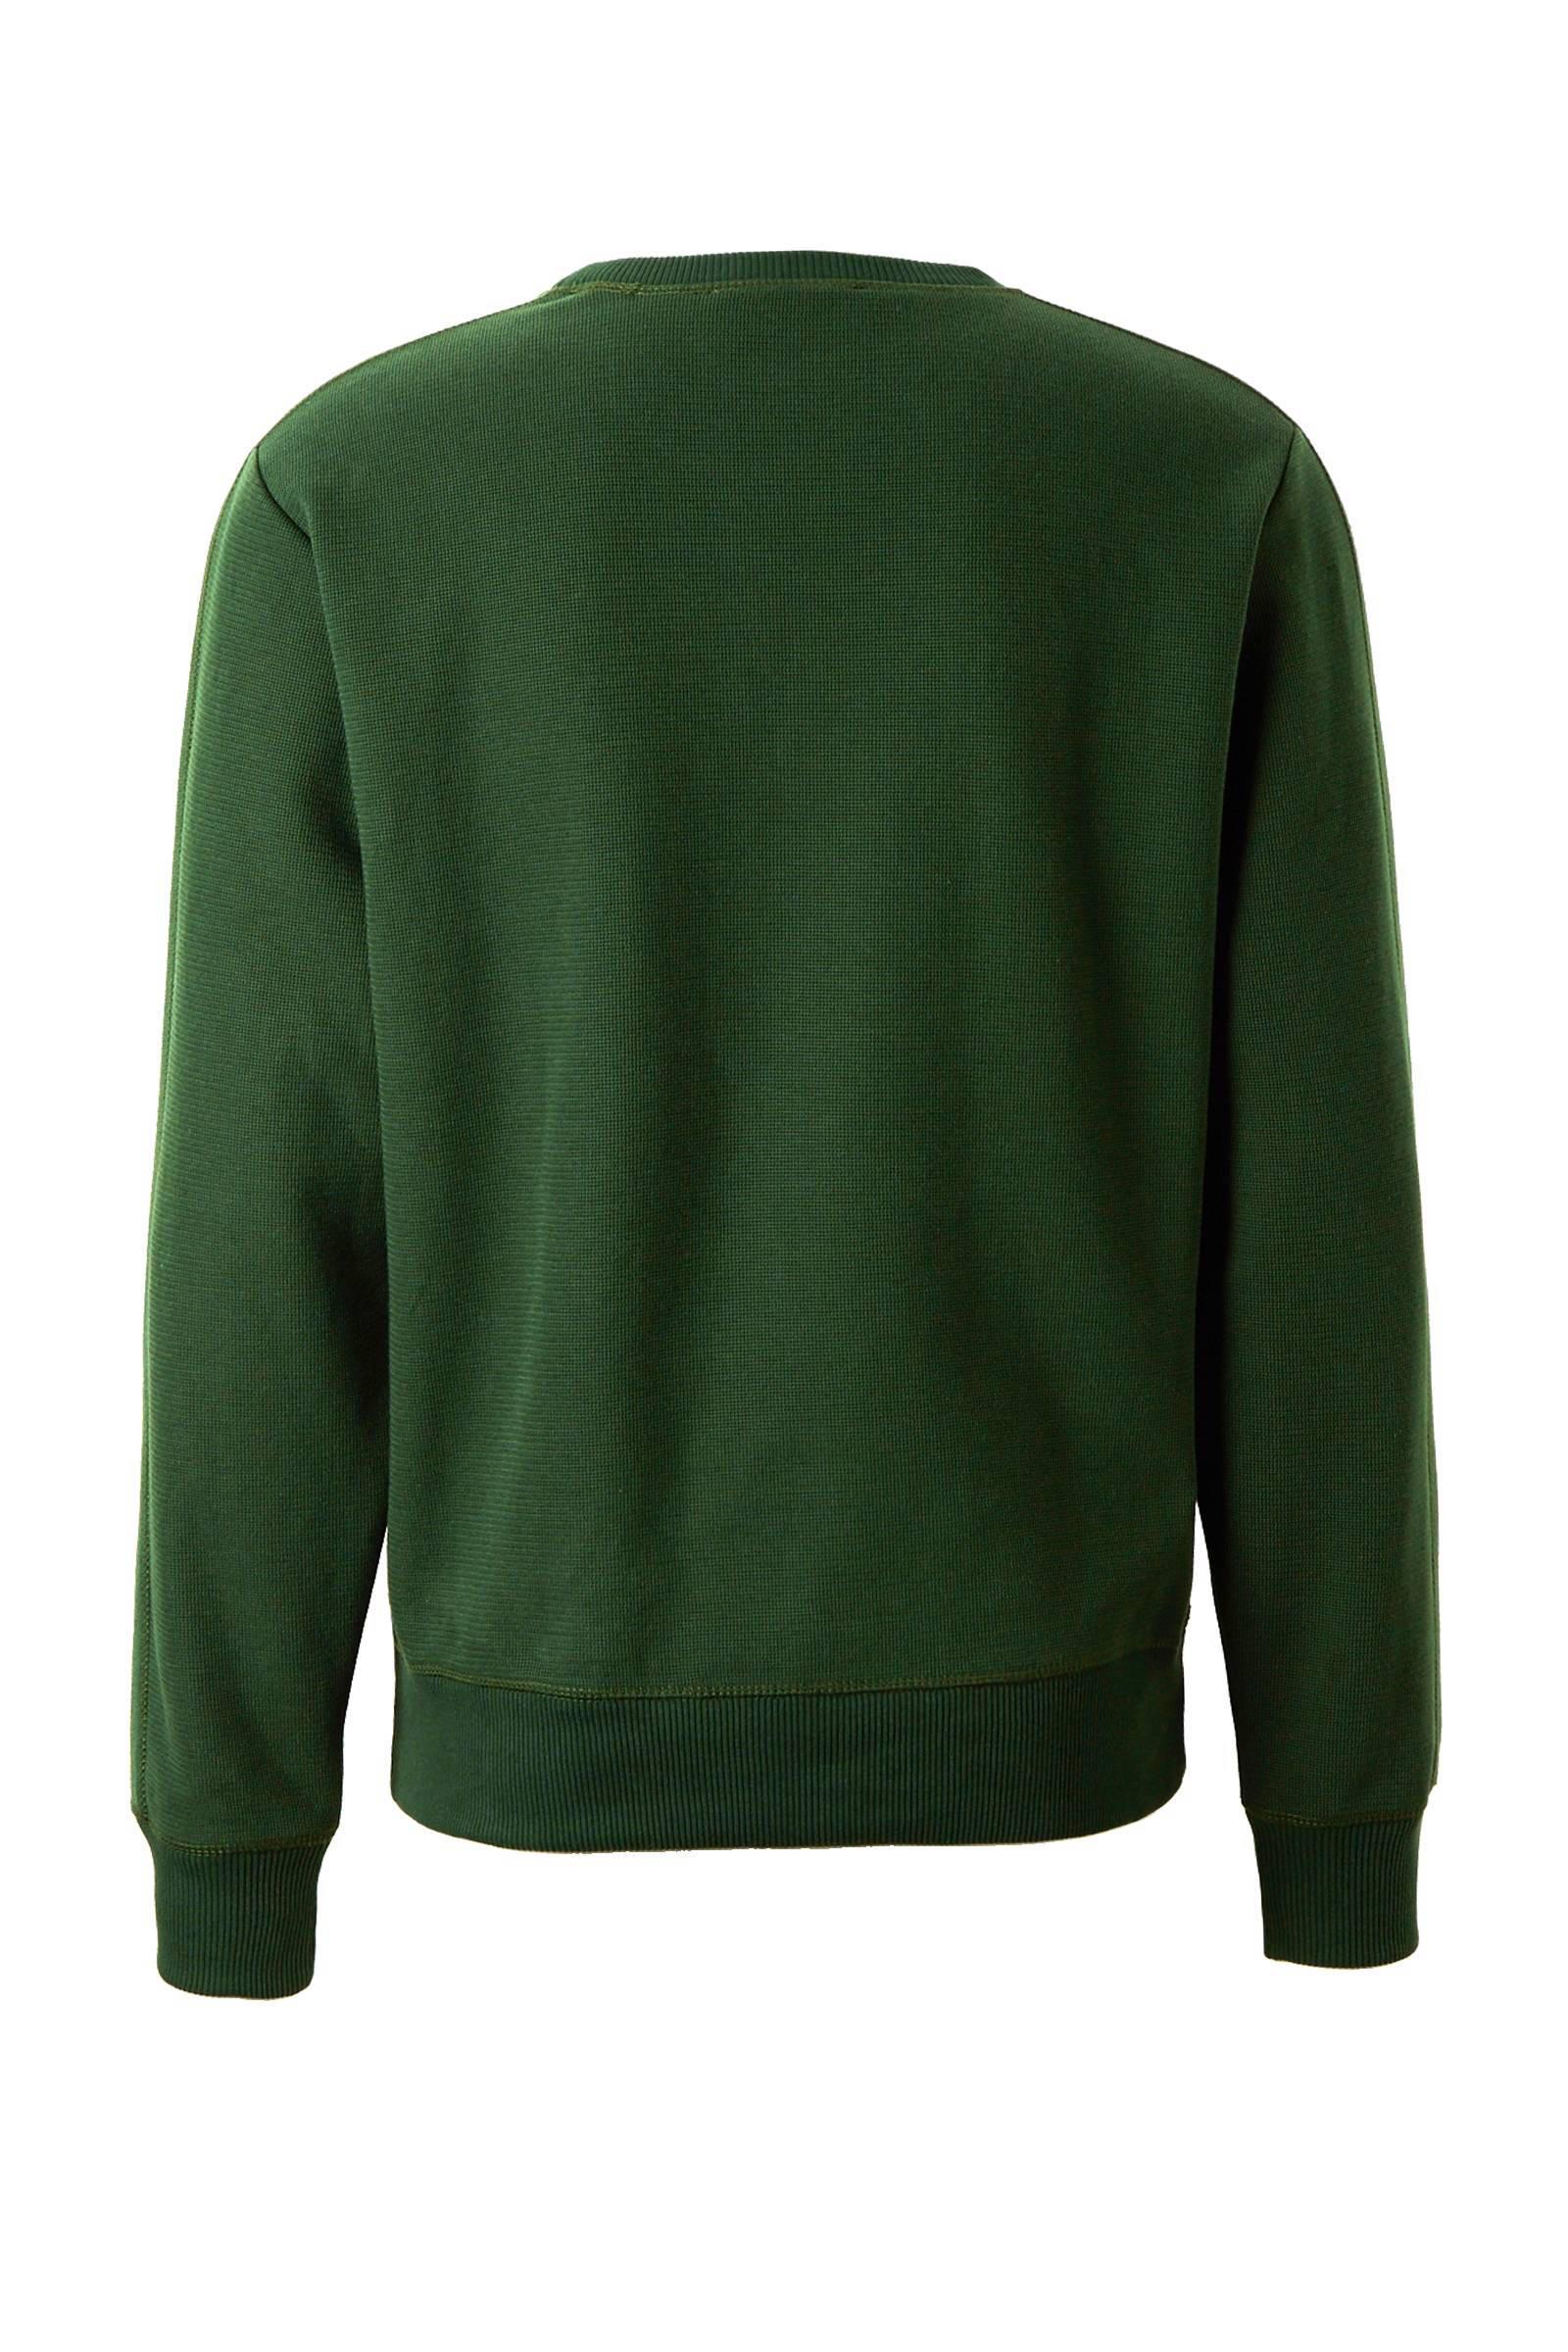 Tina Tina Tina sweater Diesel Diesel Diesel Diesel sweater sweater aZ5qwpx